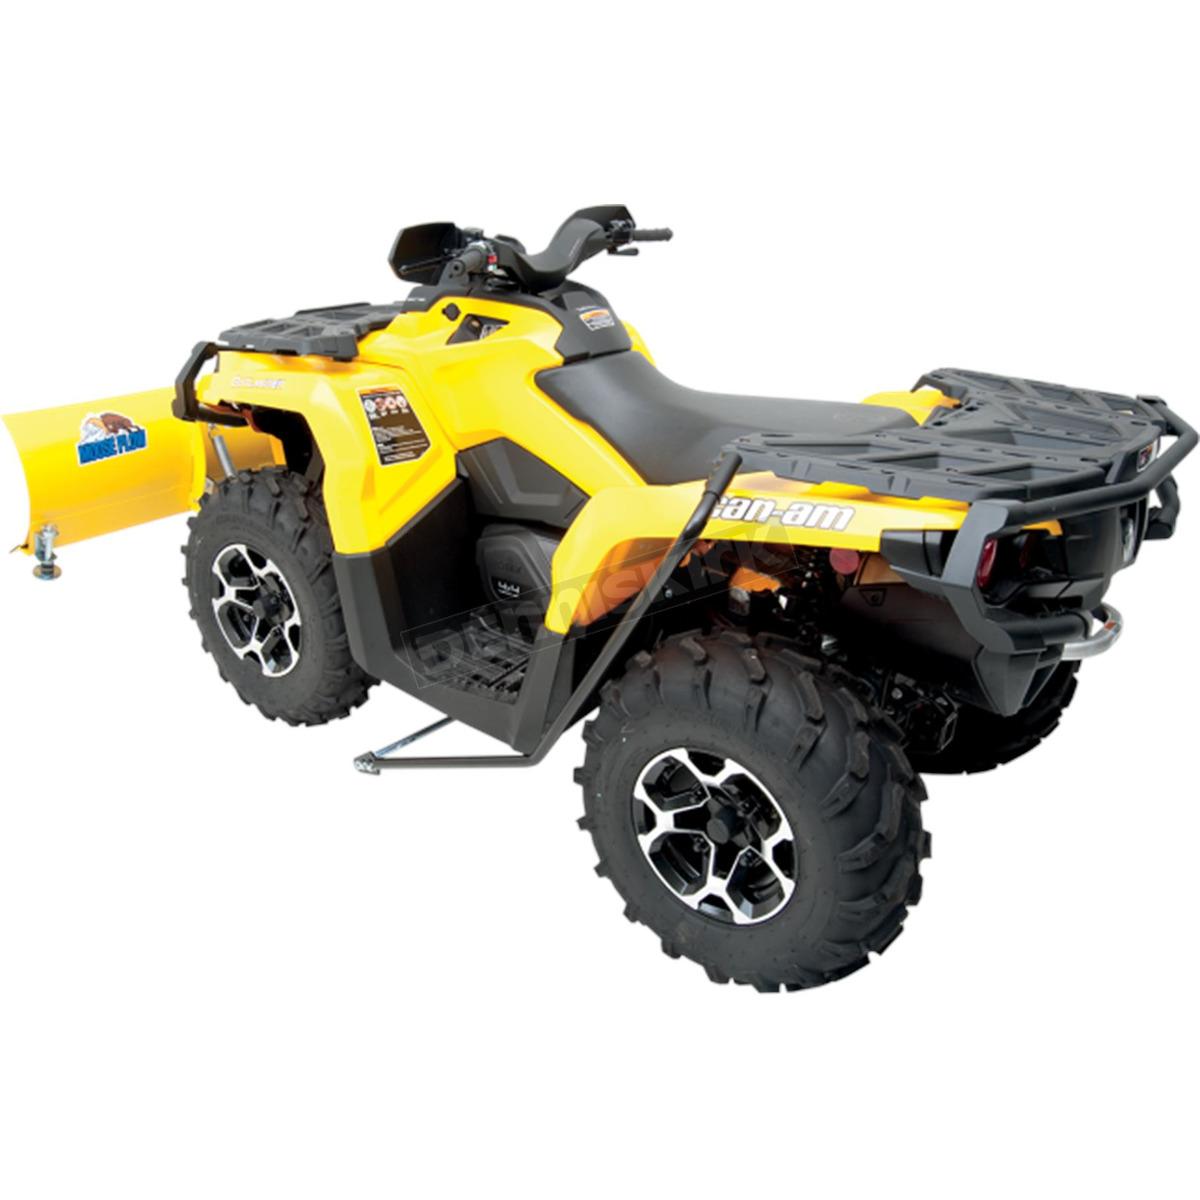 hight resolution of  universal manual plow hand lift 4501 0785